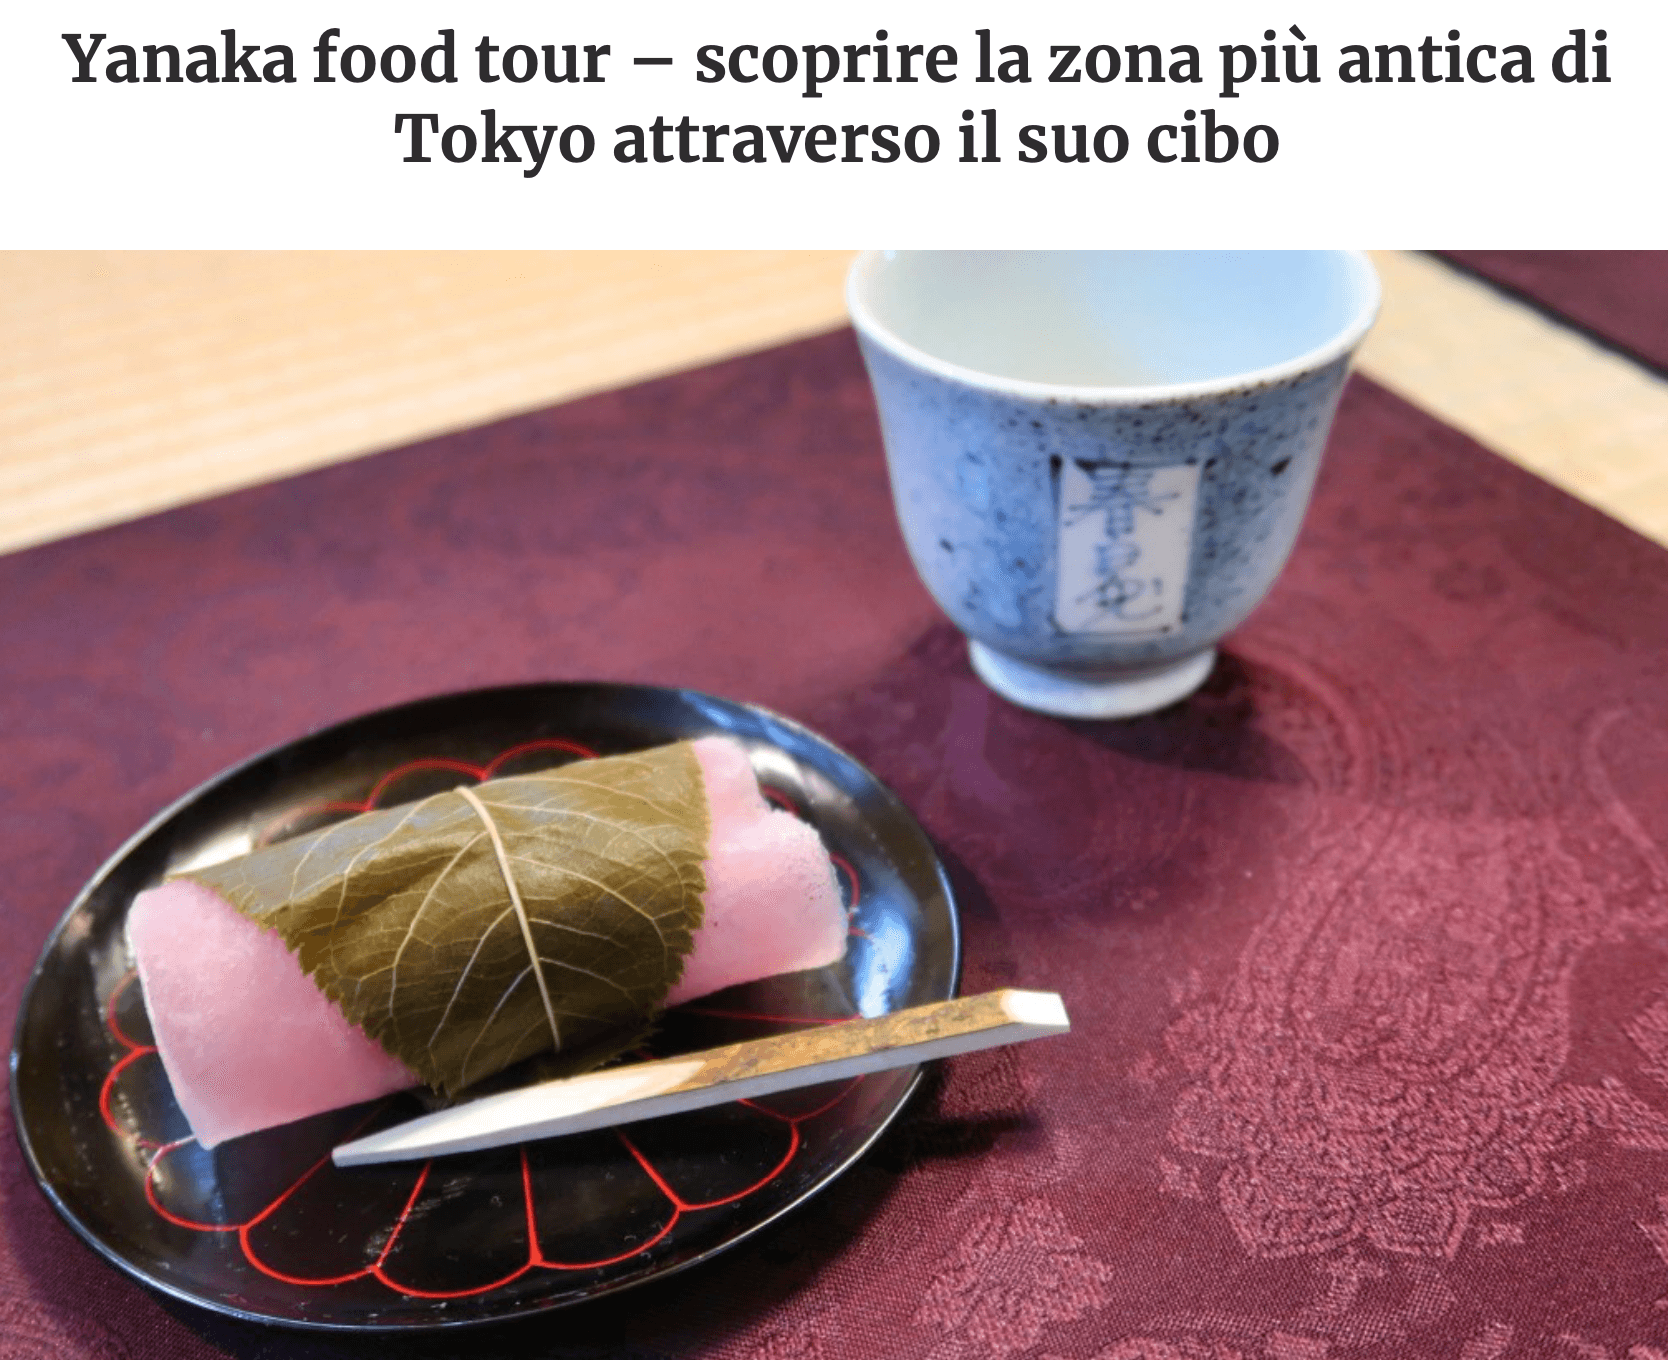 Prossima Fermata Giappone Yanaka food tour